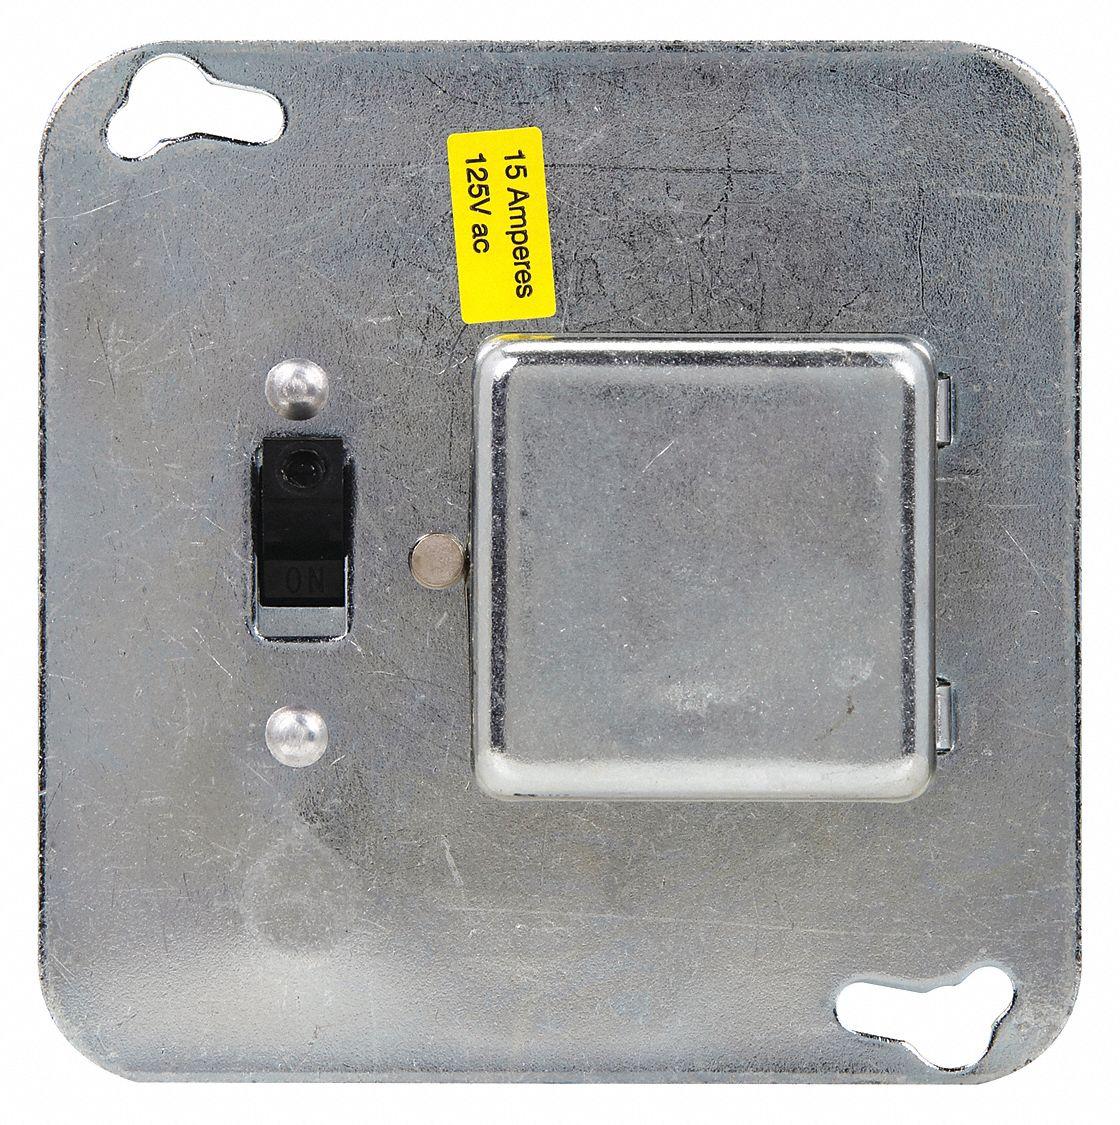 hight resolution of eaton bussmann plug fuse box cover unit 4 square box type 15 amps ac 125vac voltage 1dl58 ssy grainger